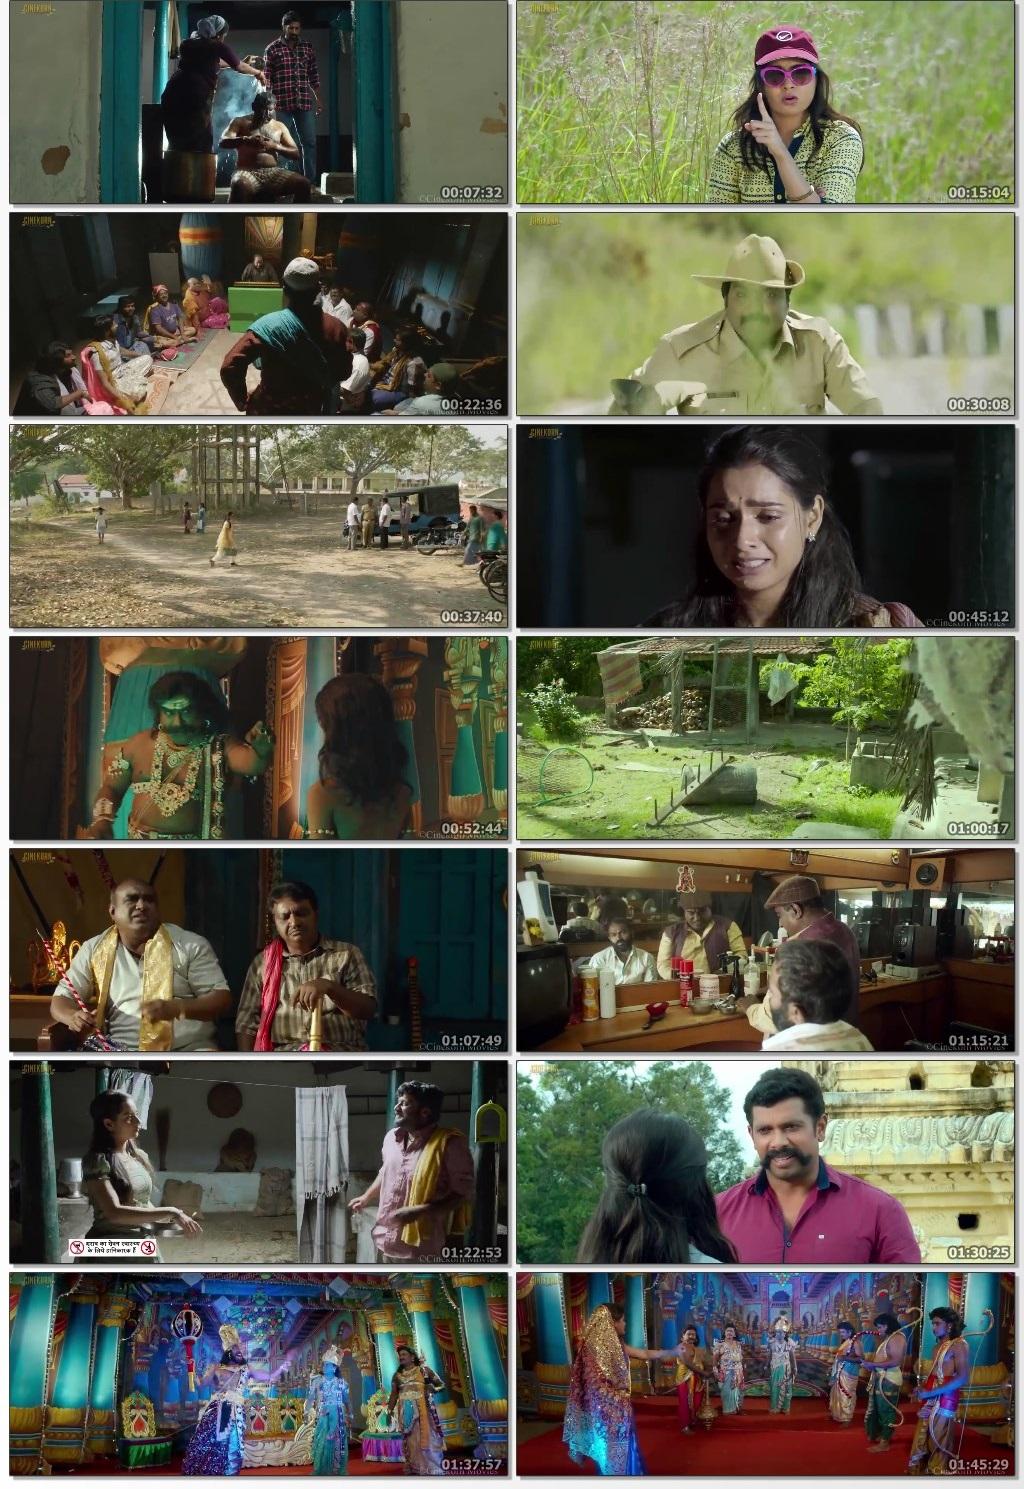 Once-More-Kaurava-2021-www-9kmovies-cards-Hindi-Dubbed-720p-HDRip-780-MB-mkv-thumbs000e1cc5063e4aa9